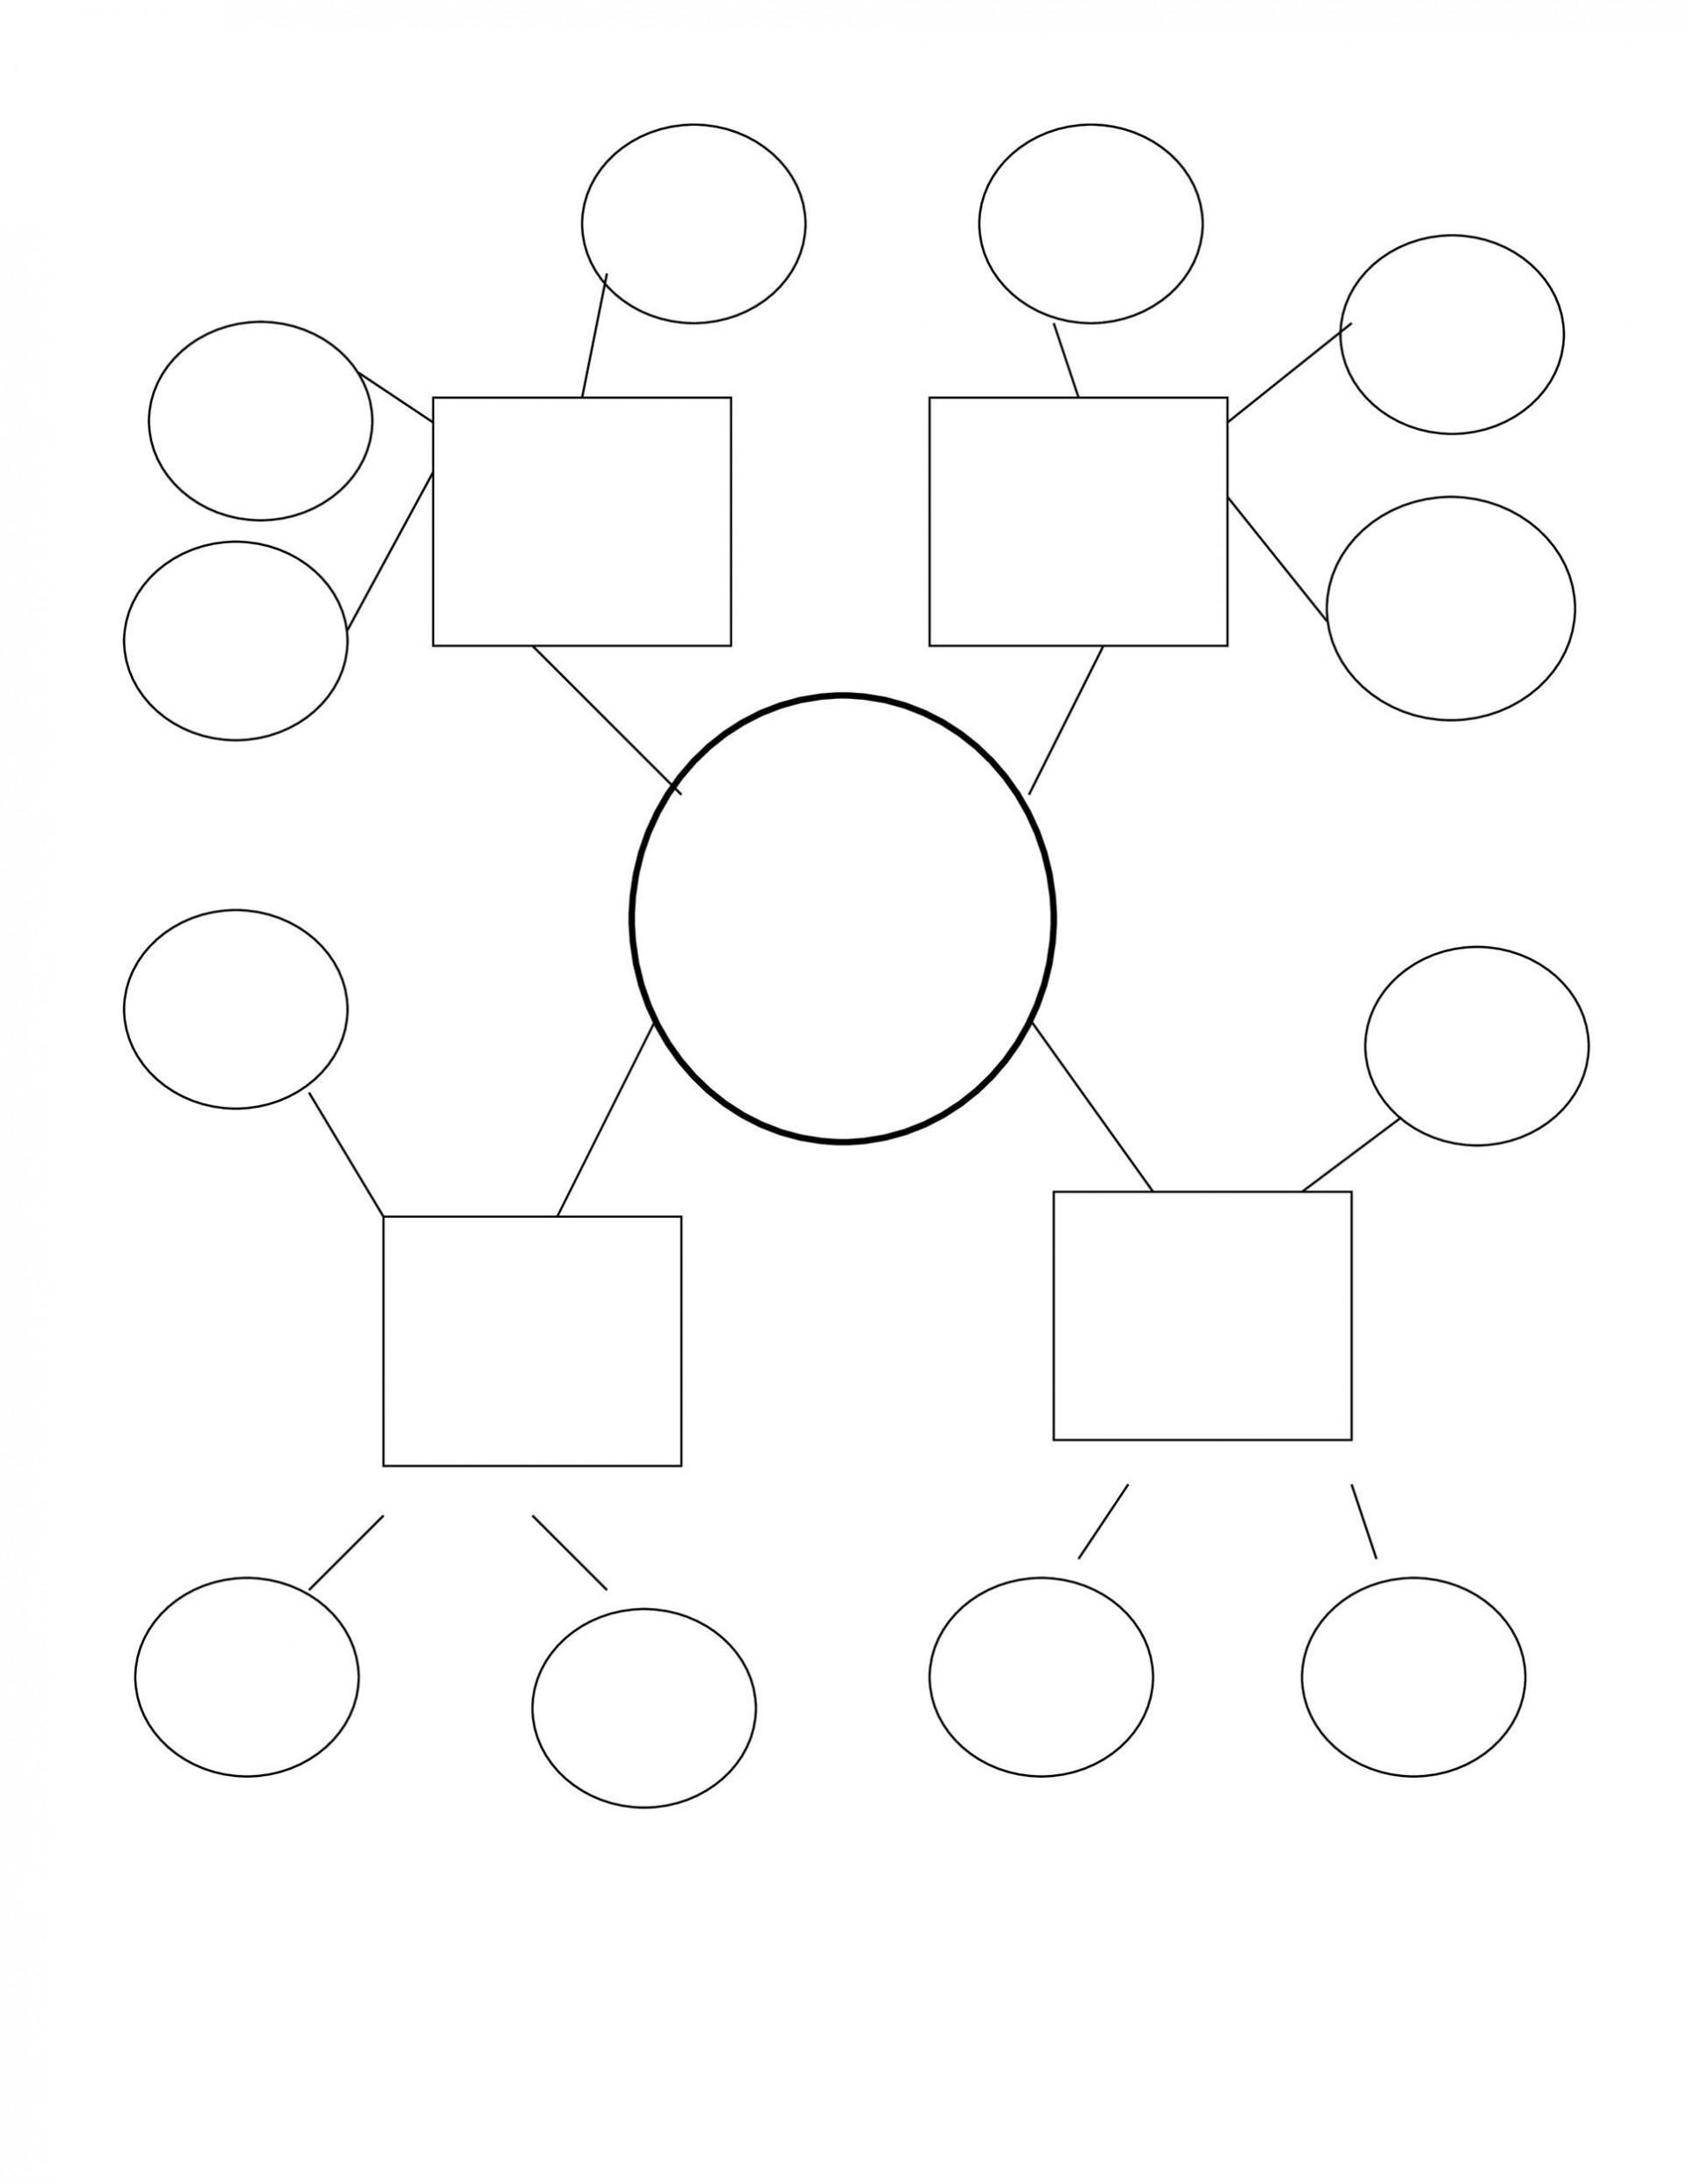 010 Remarkable Free Blank Concept Map Template Sample  Printable Nursing1920